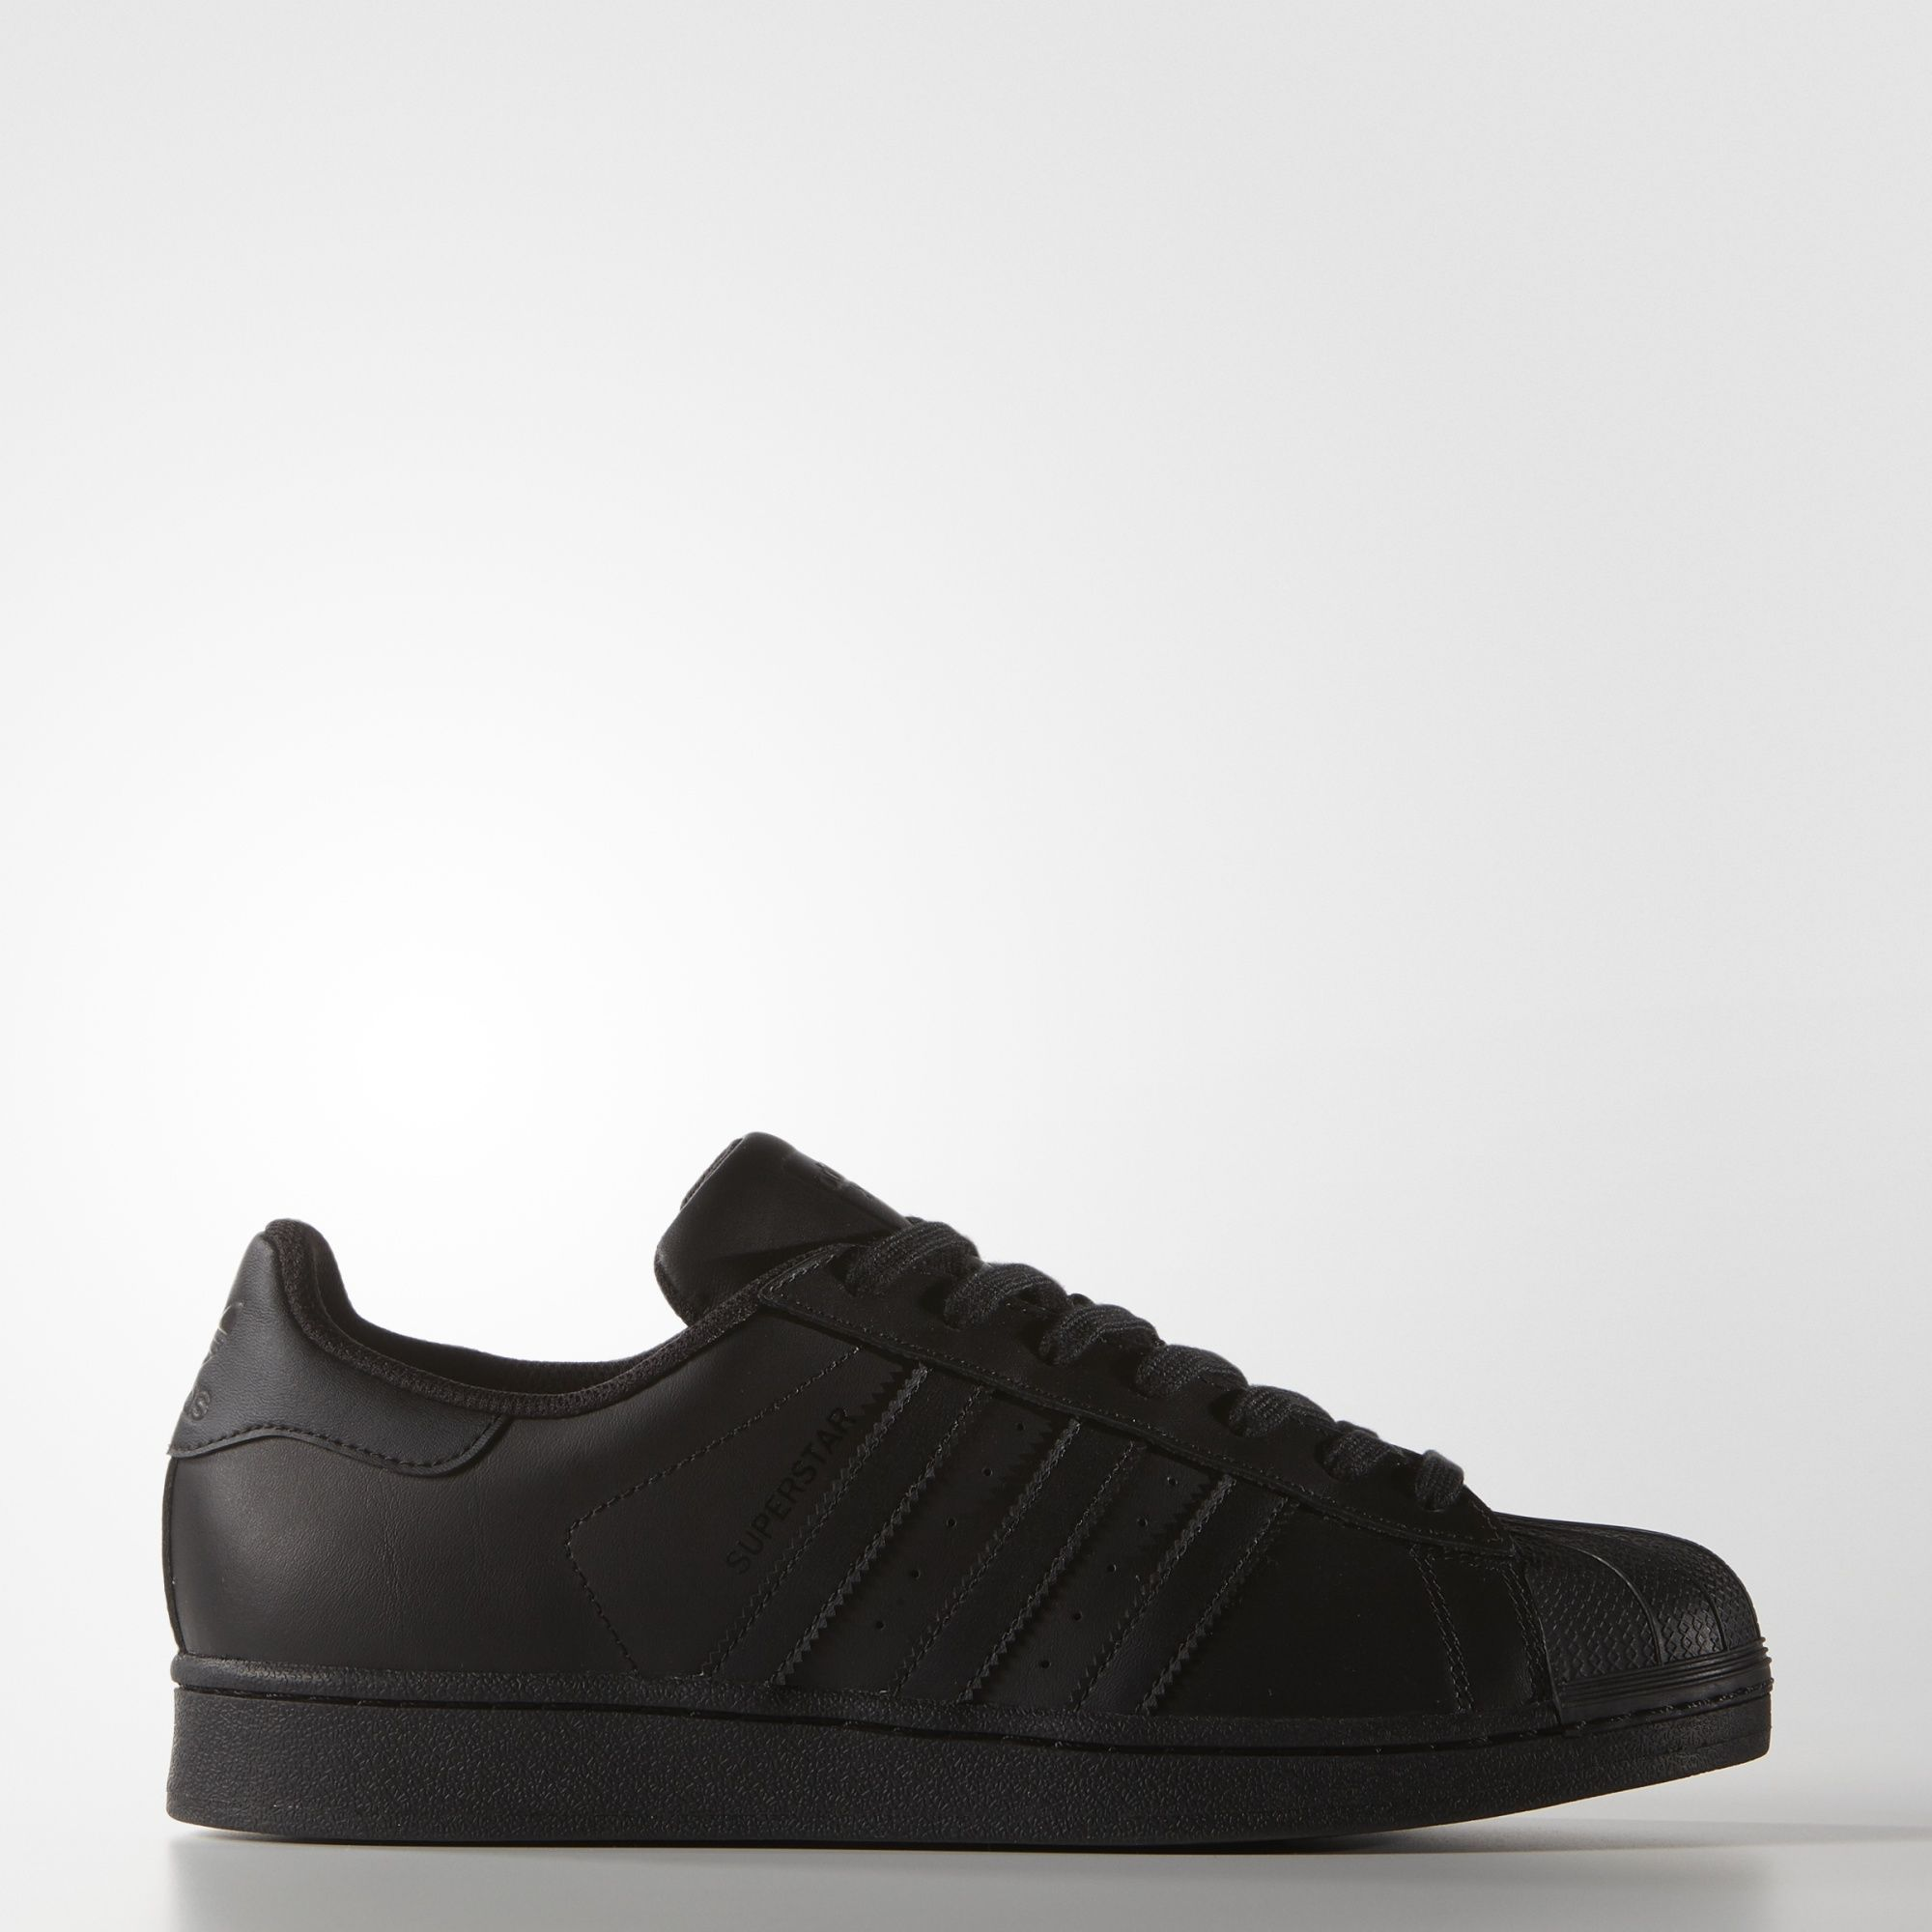 Superstar Shoes   Zapatillas adidas superstar, Adidas